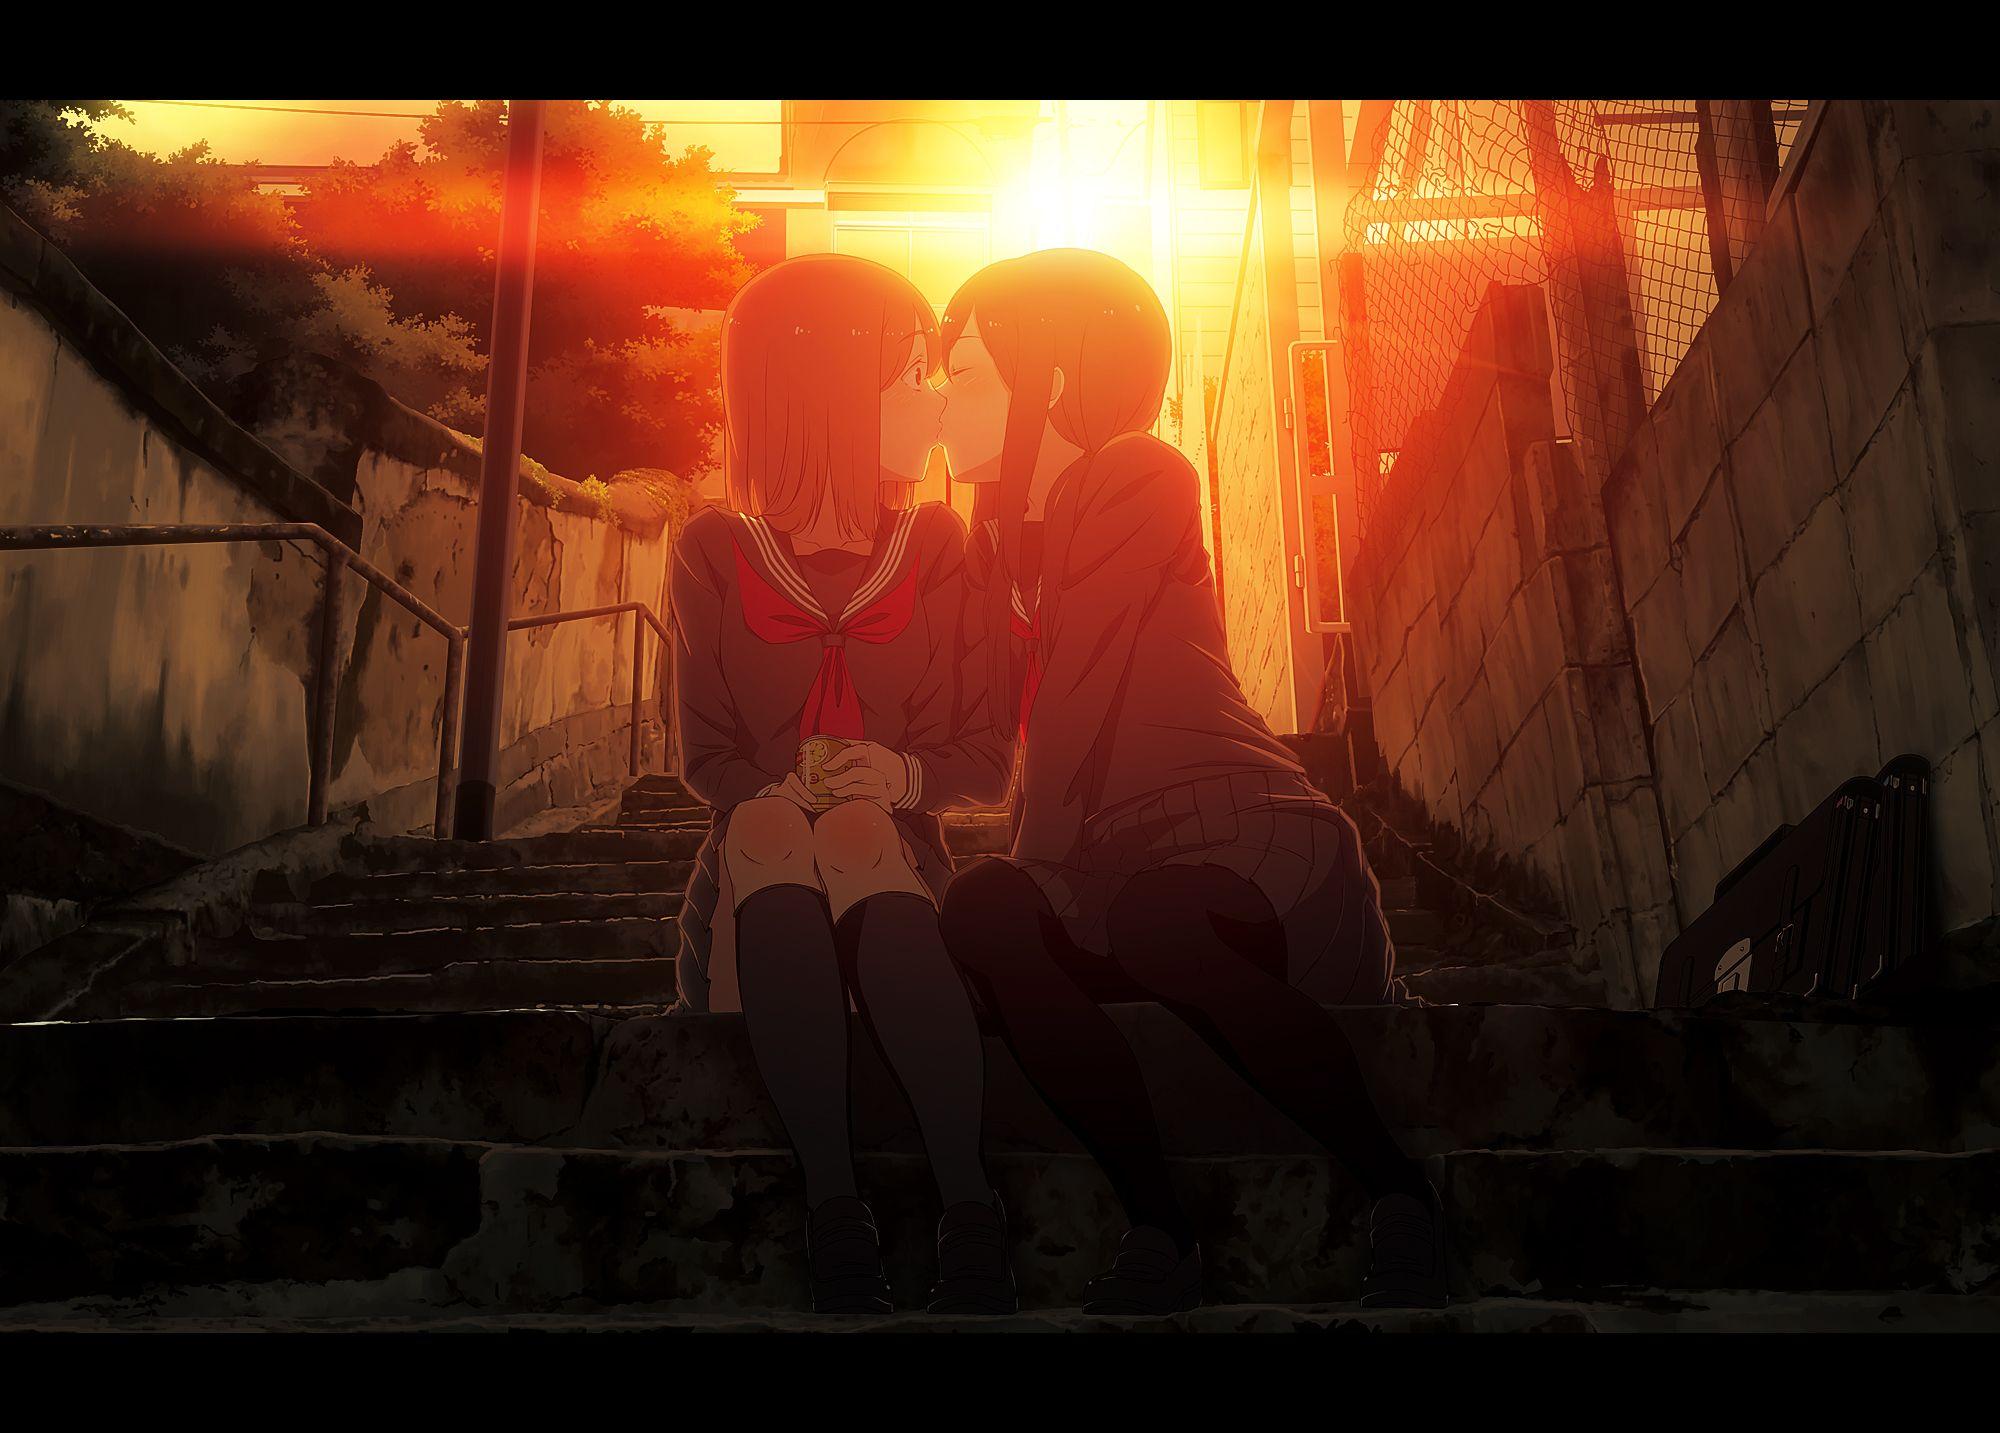 Целующиеся аниме девушки фото